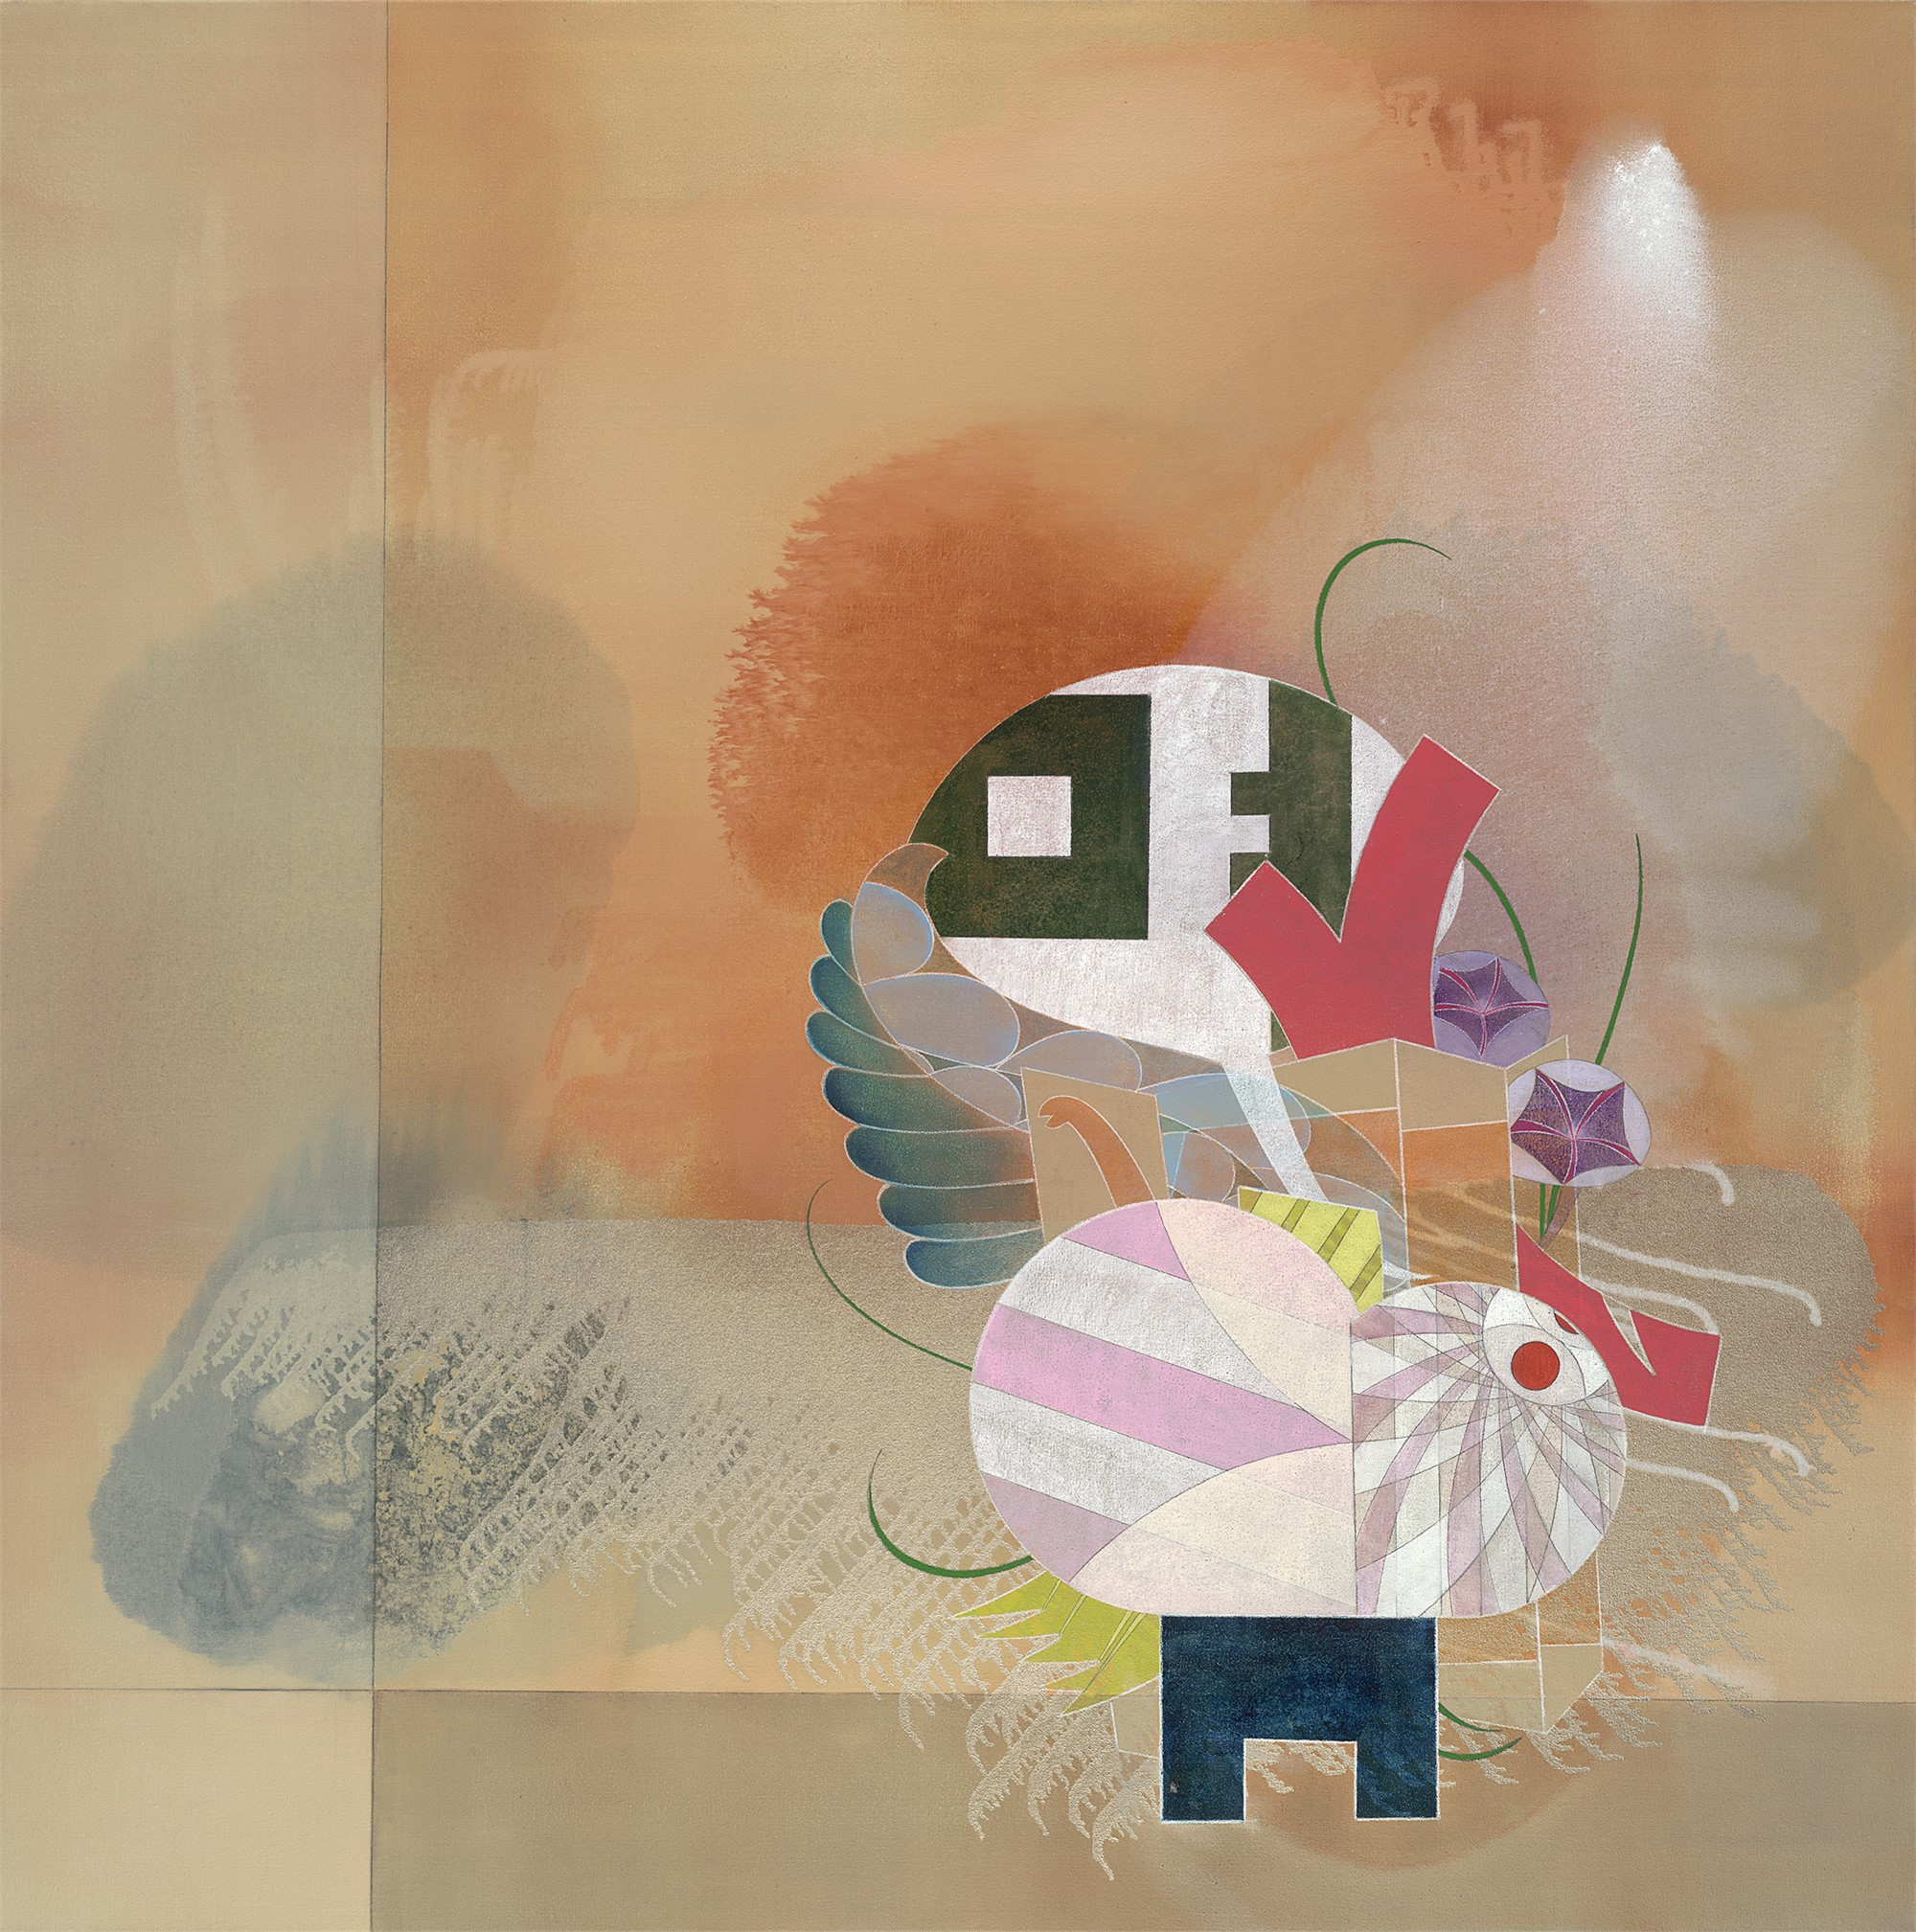 Arala by Kuzana Ogg